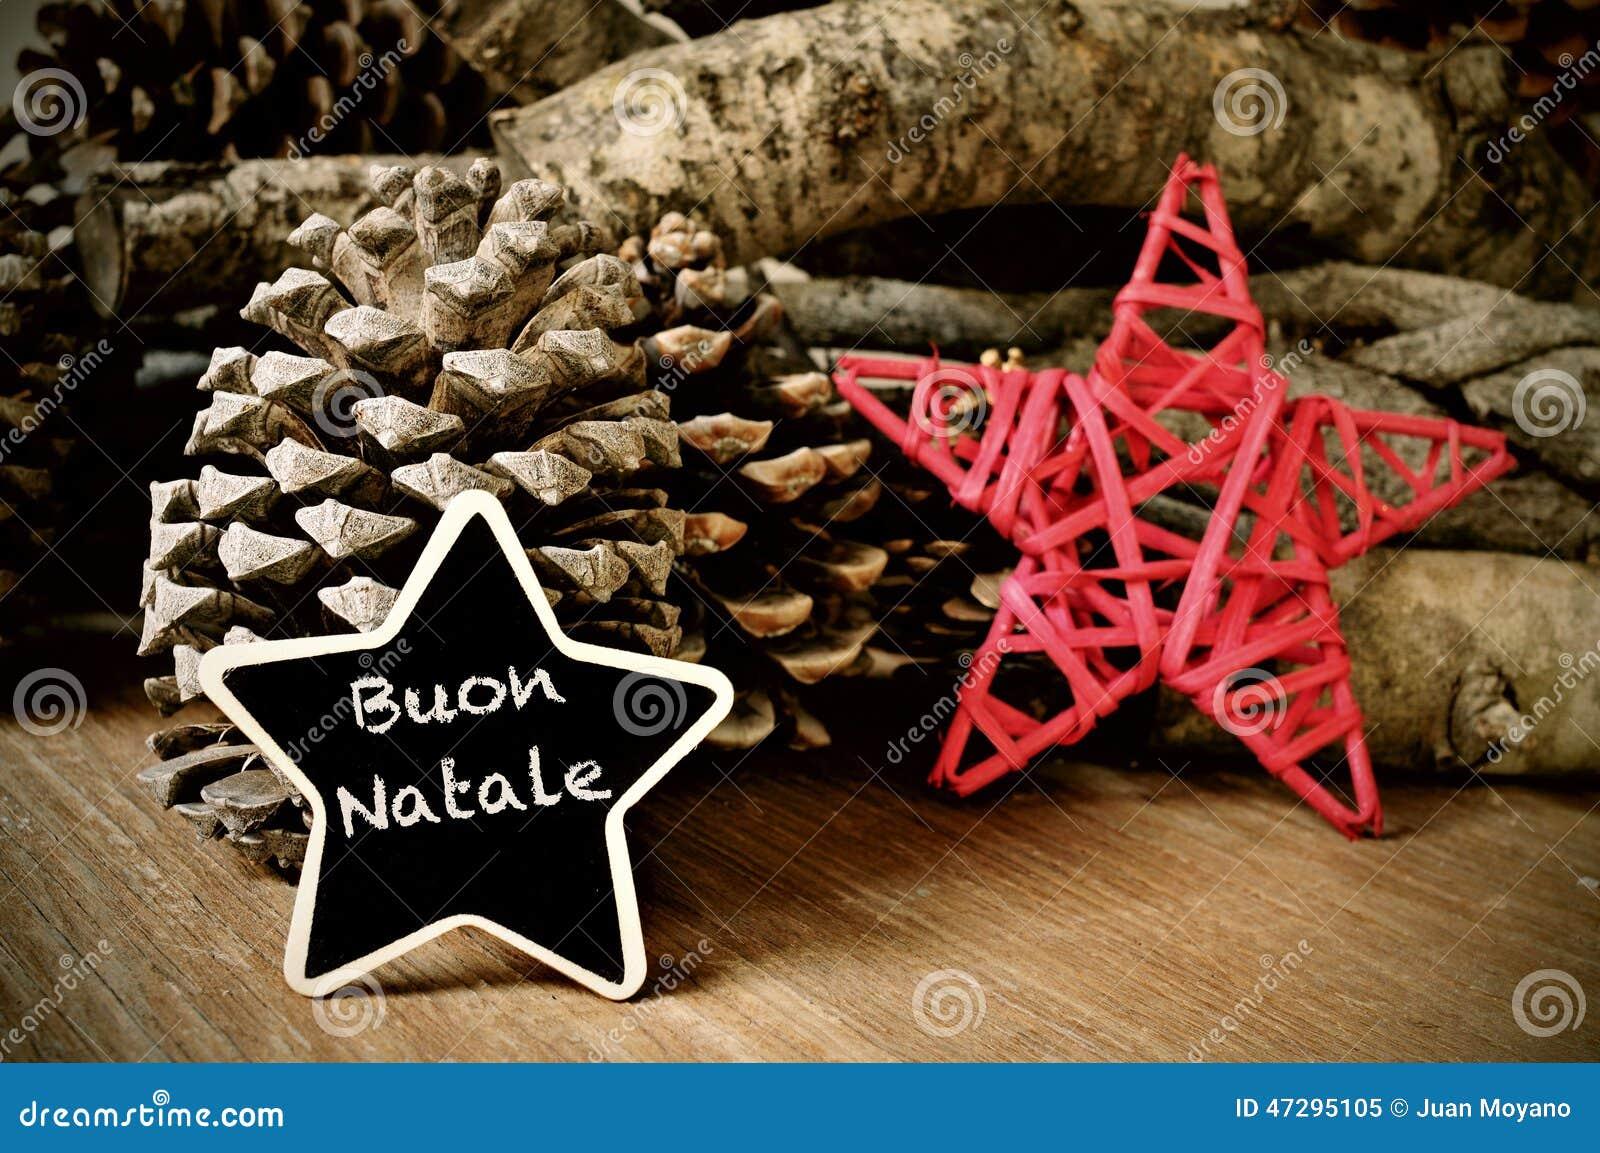 Buon Natale 105.Buon Natale Merry Christmas In Italian Stock Image Image Of